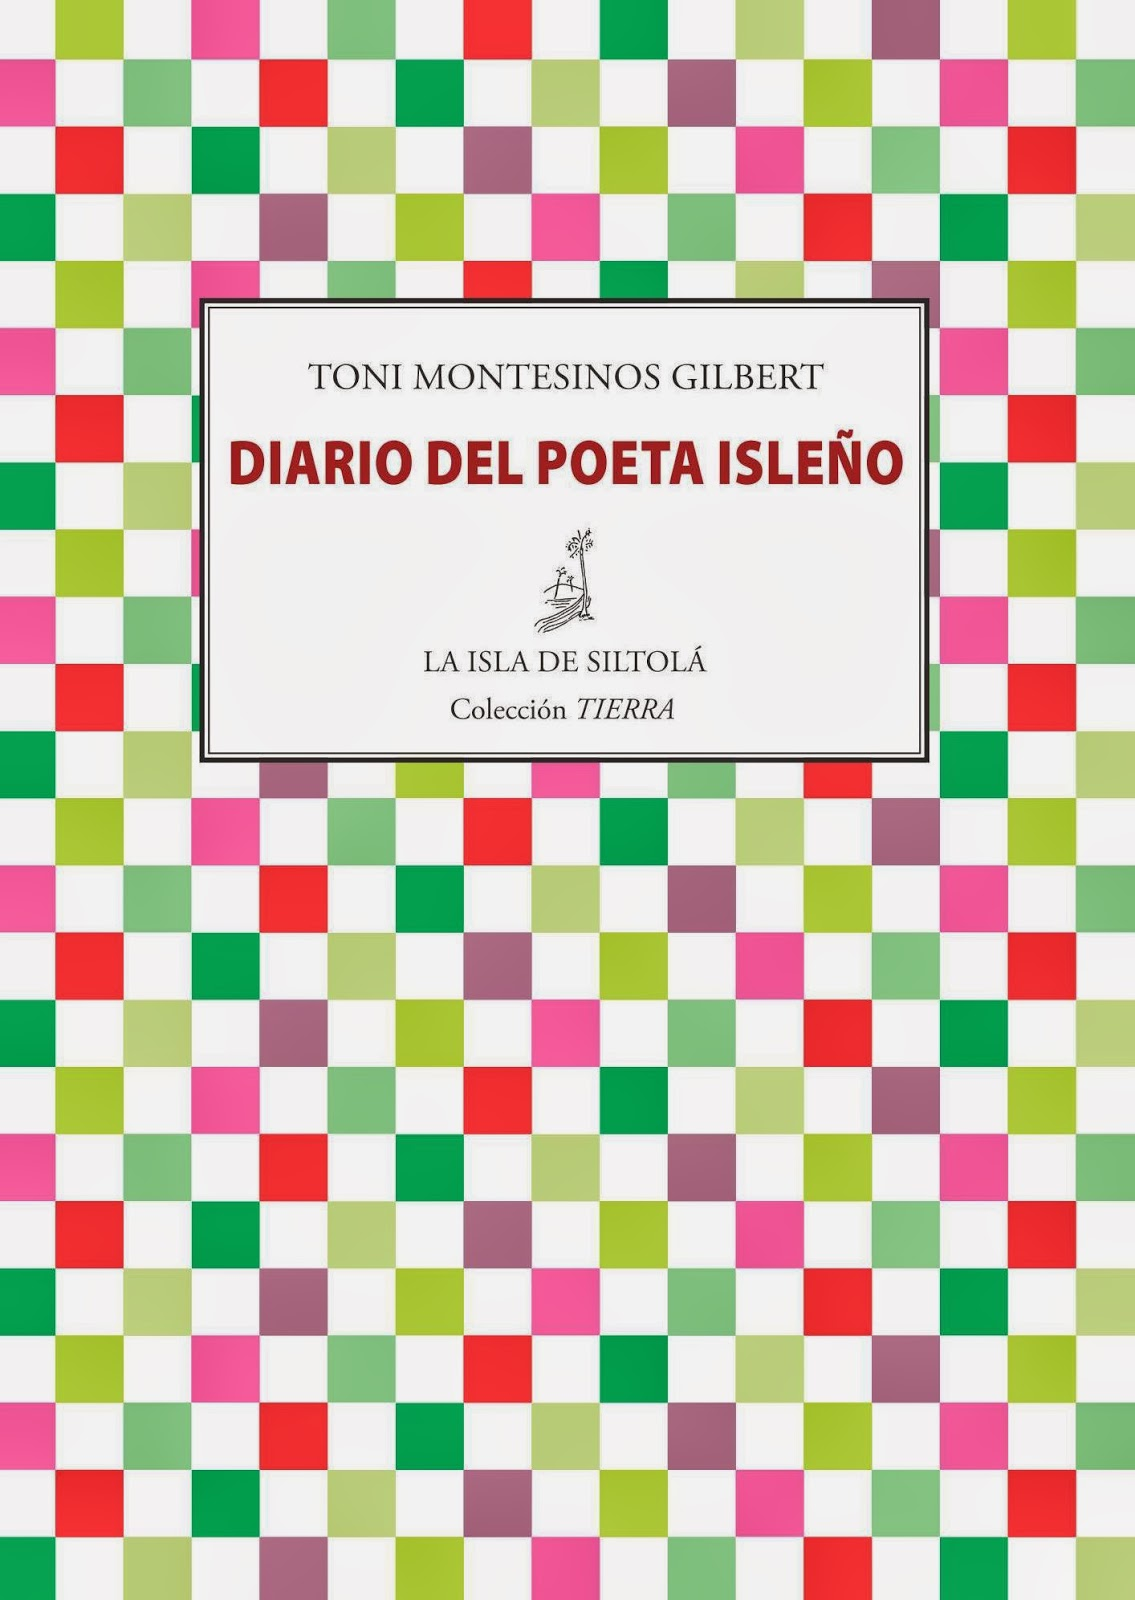 Cubierta Diario del poeta isleño web